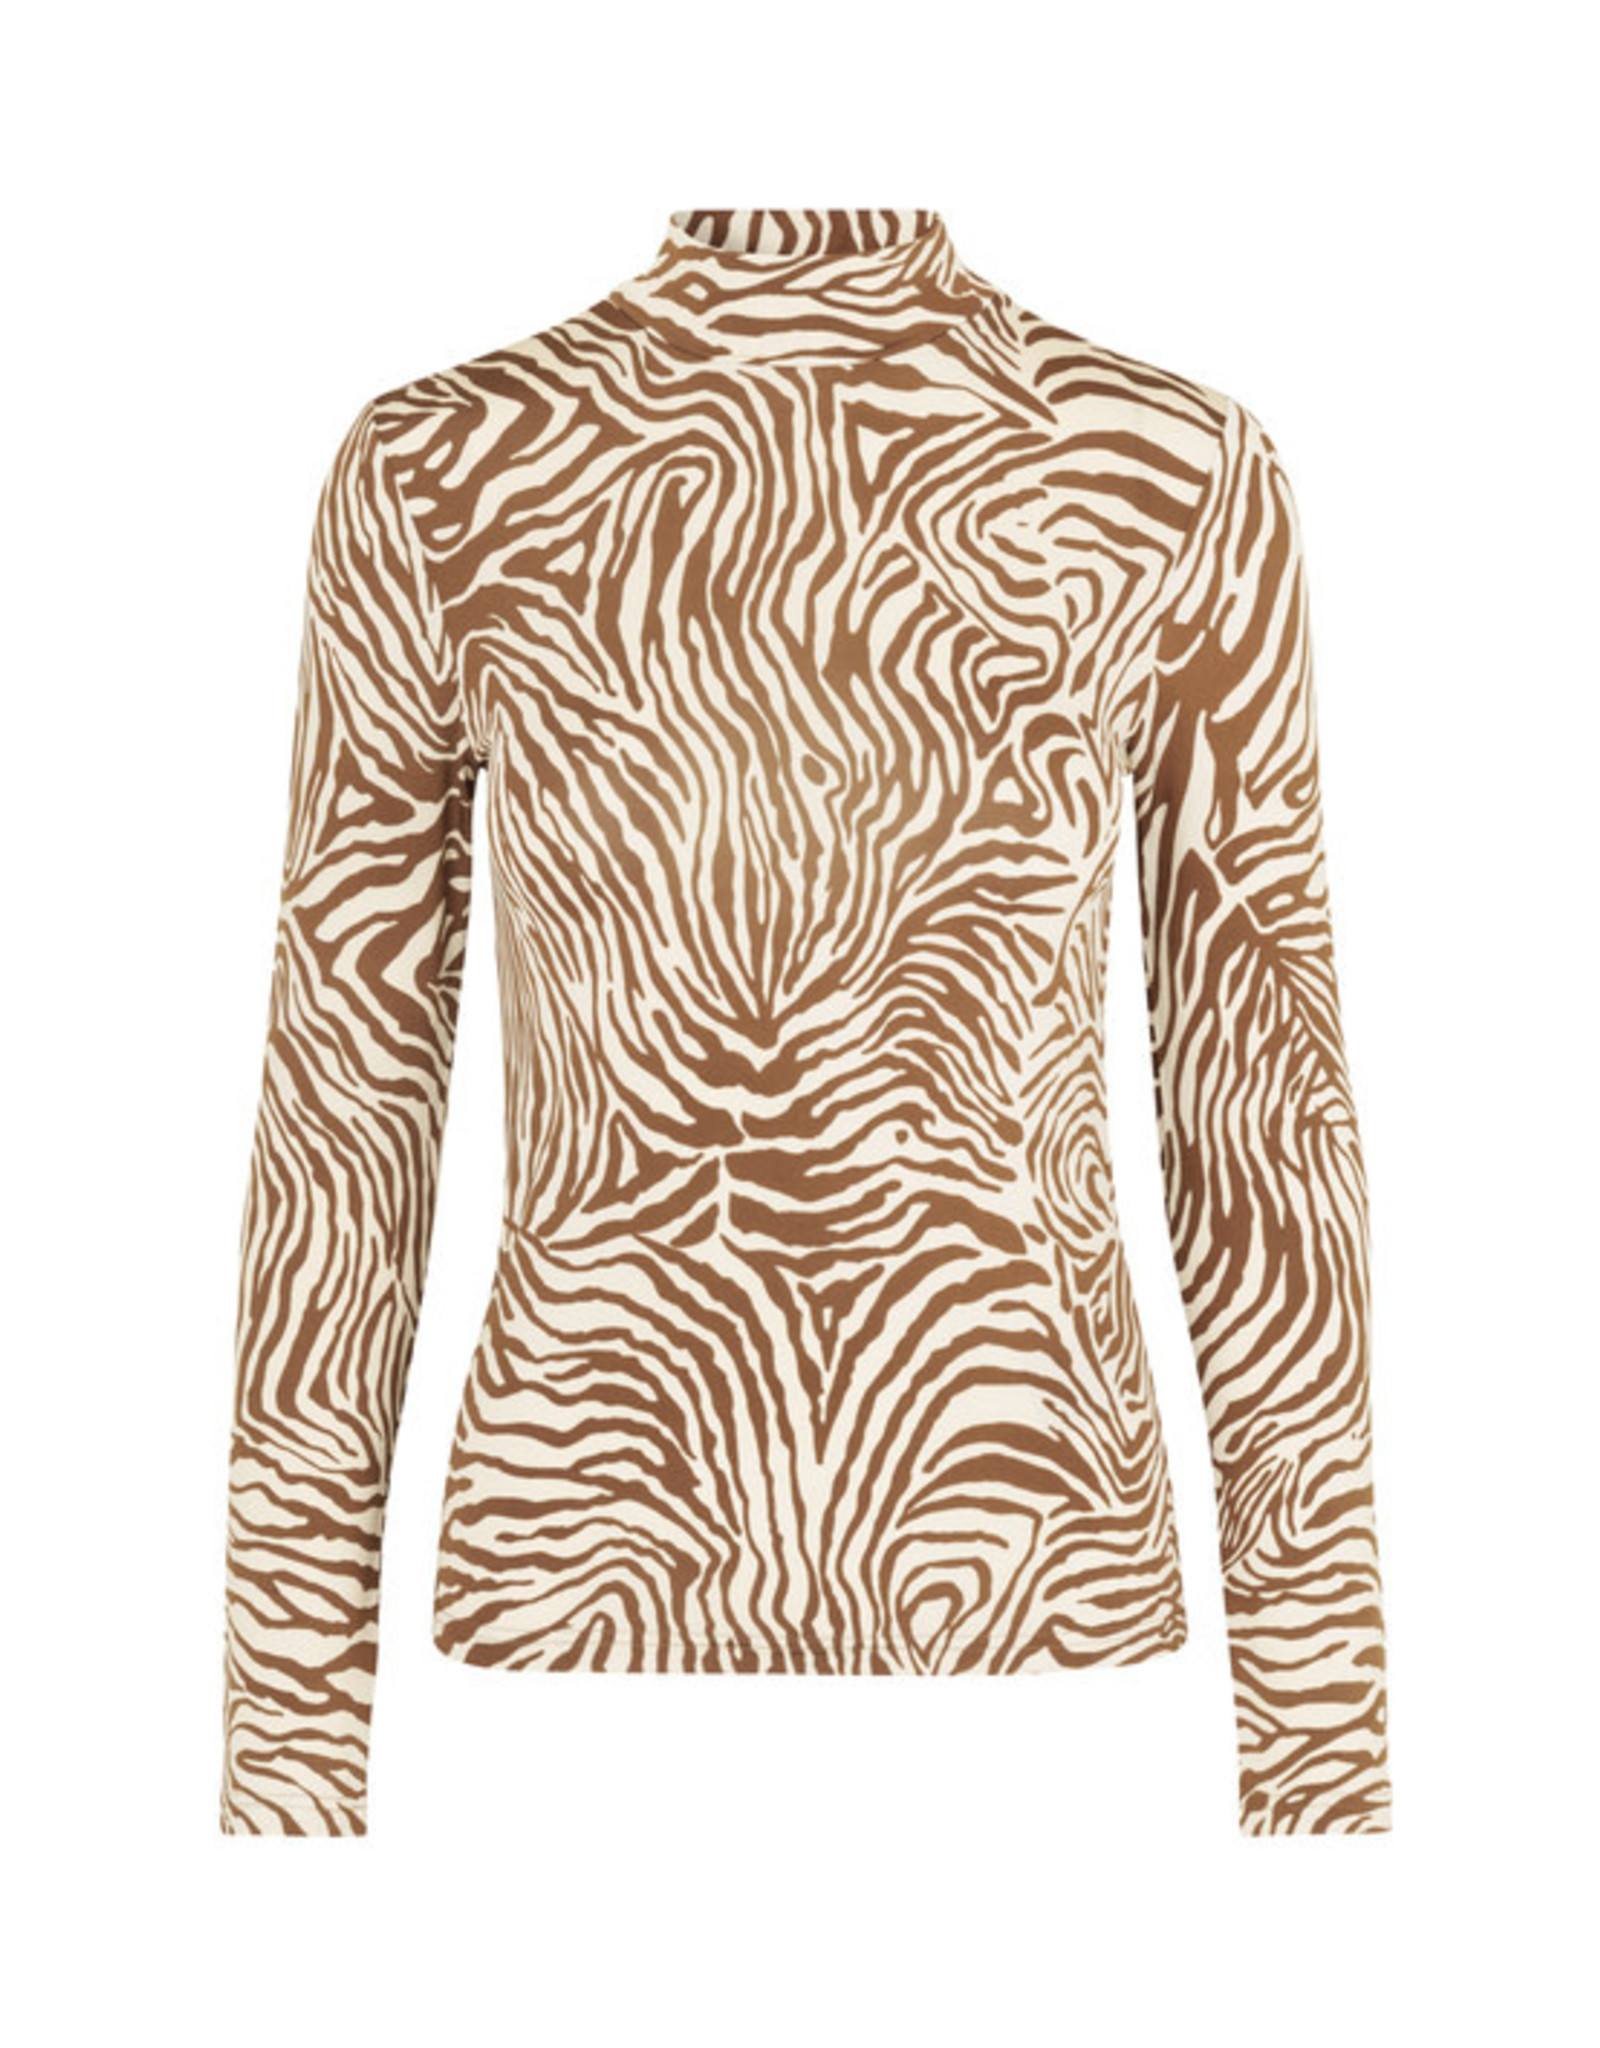 Samsoe & Samsoe Elsi t-n t-shirt ls aop Mountain zebra